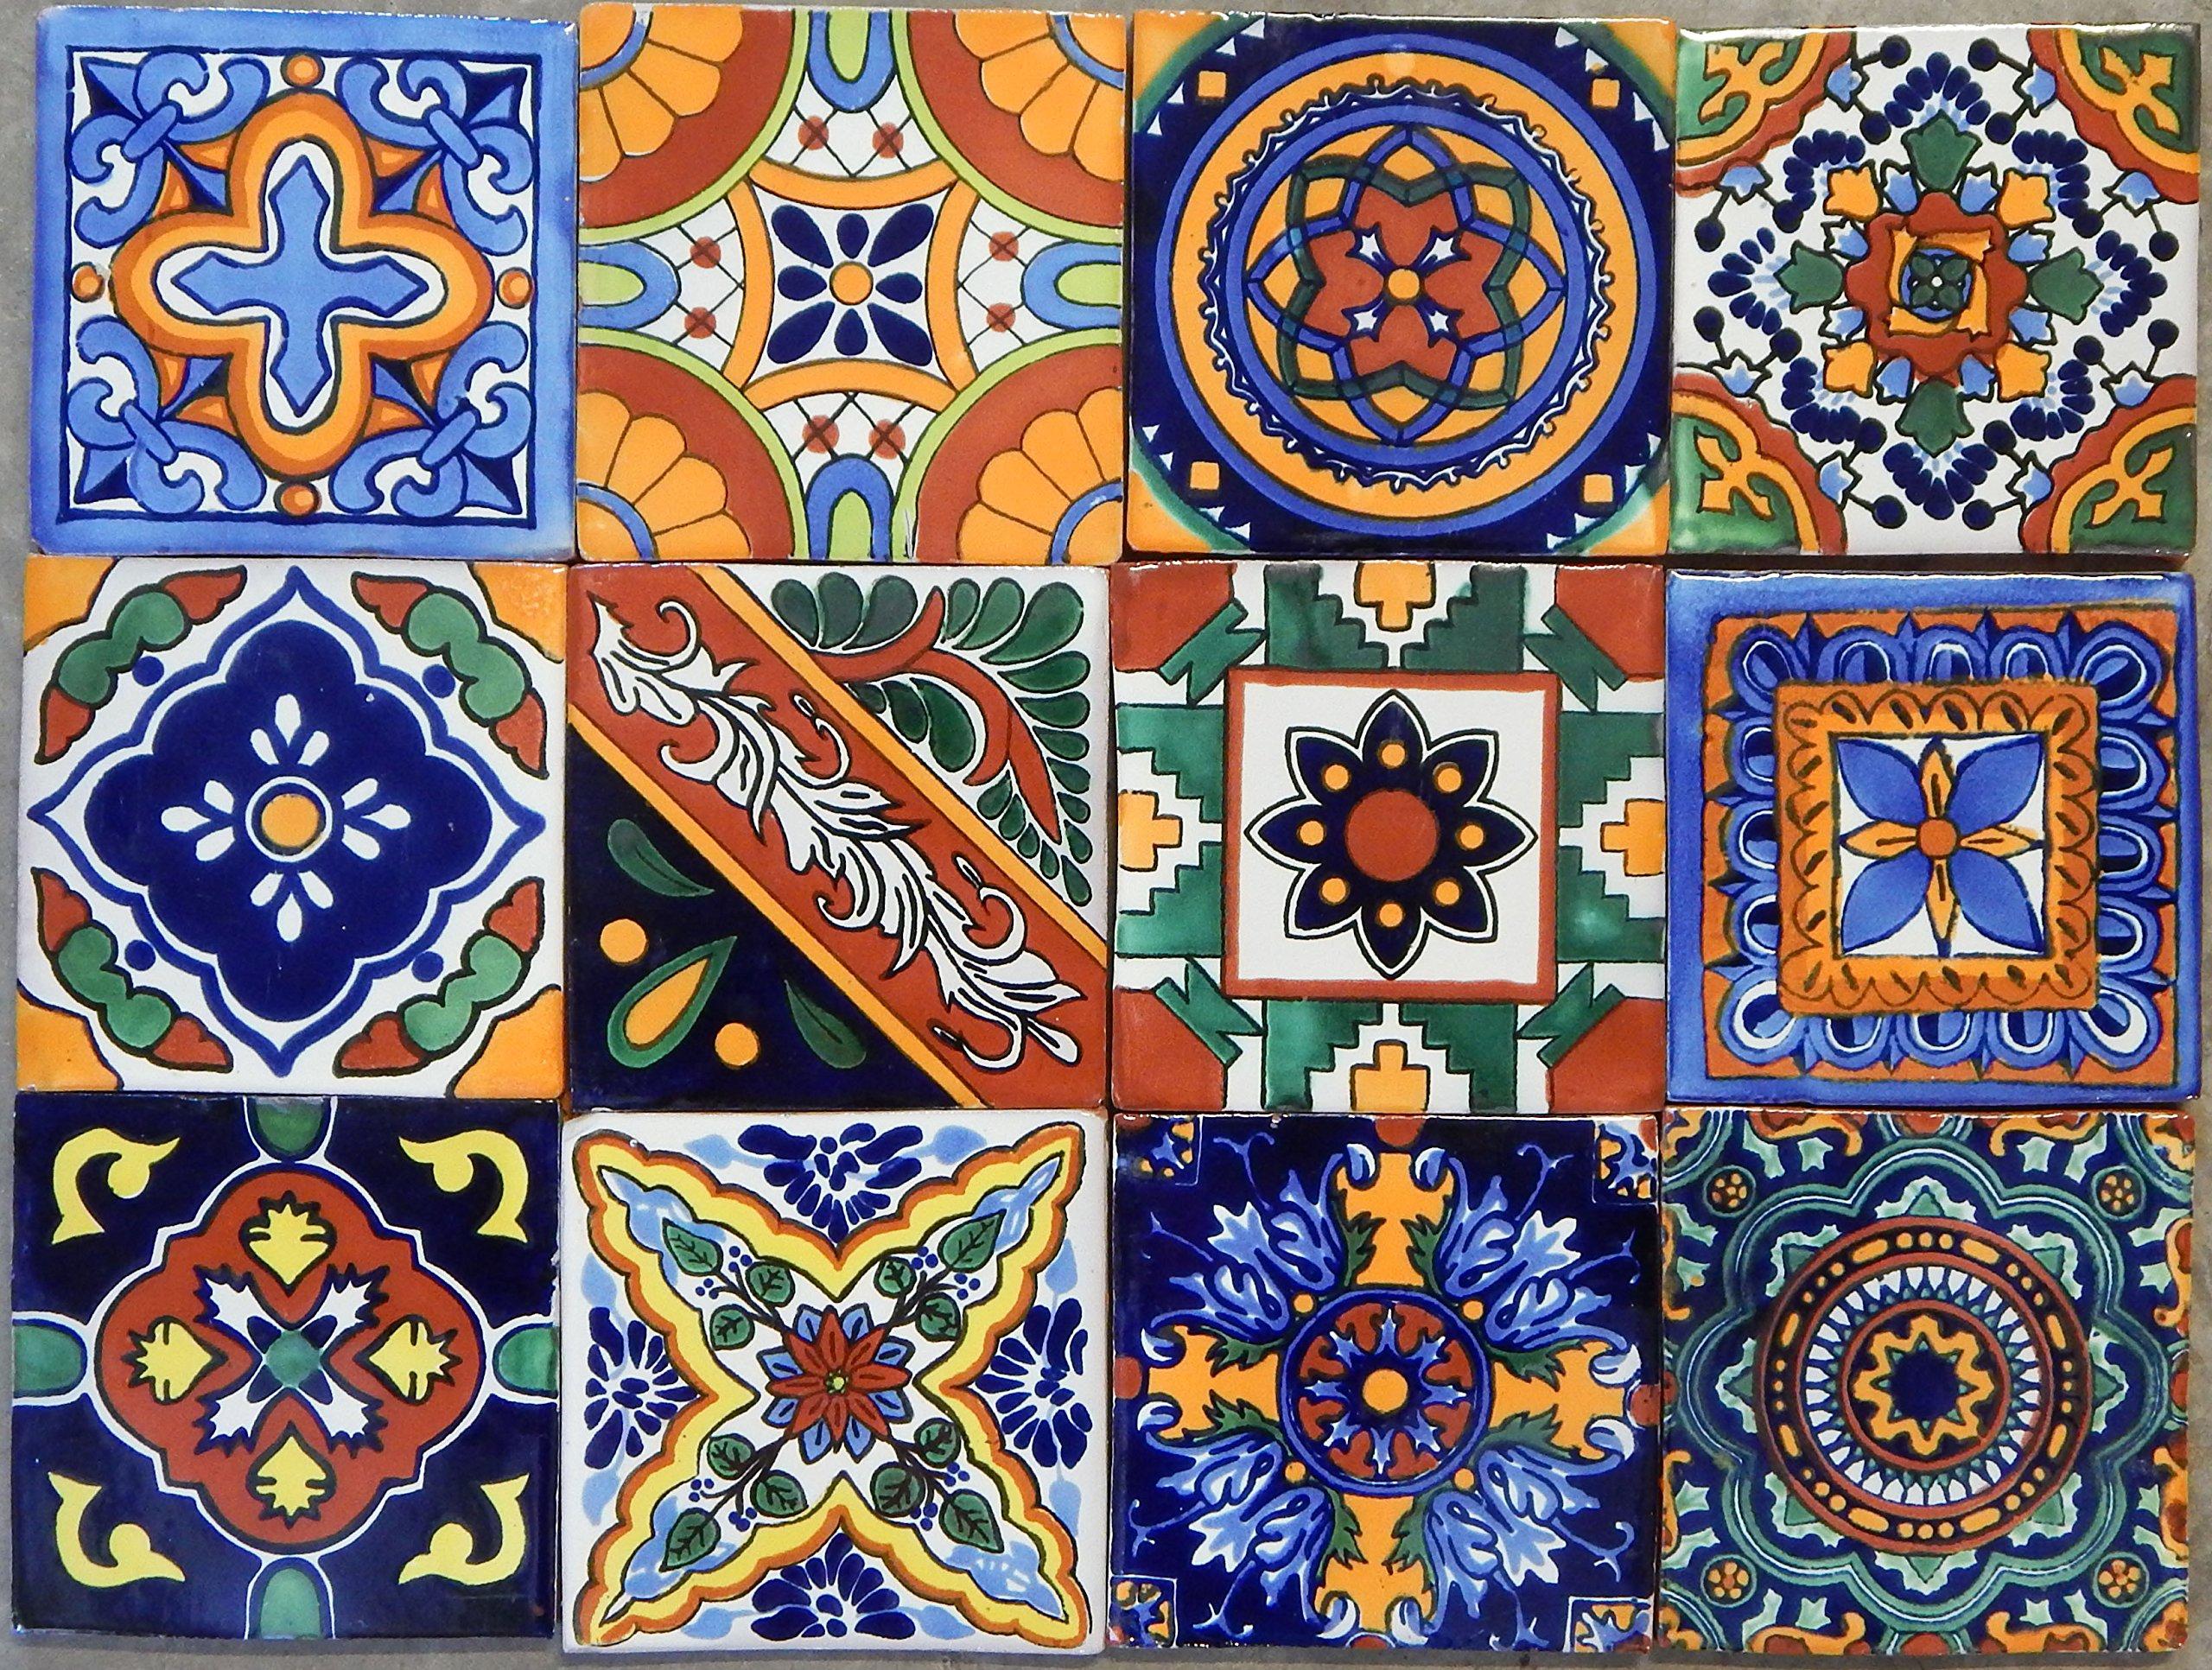 40 Mexican Talavera Tiles Hand Painted 6''x6'' Stairs Backsplash 10 Designs by COLOR Y TRADICIÓN